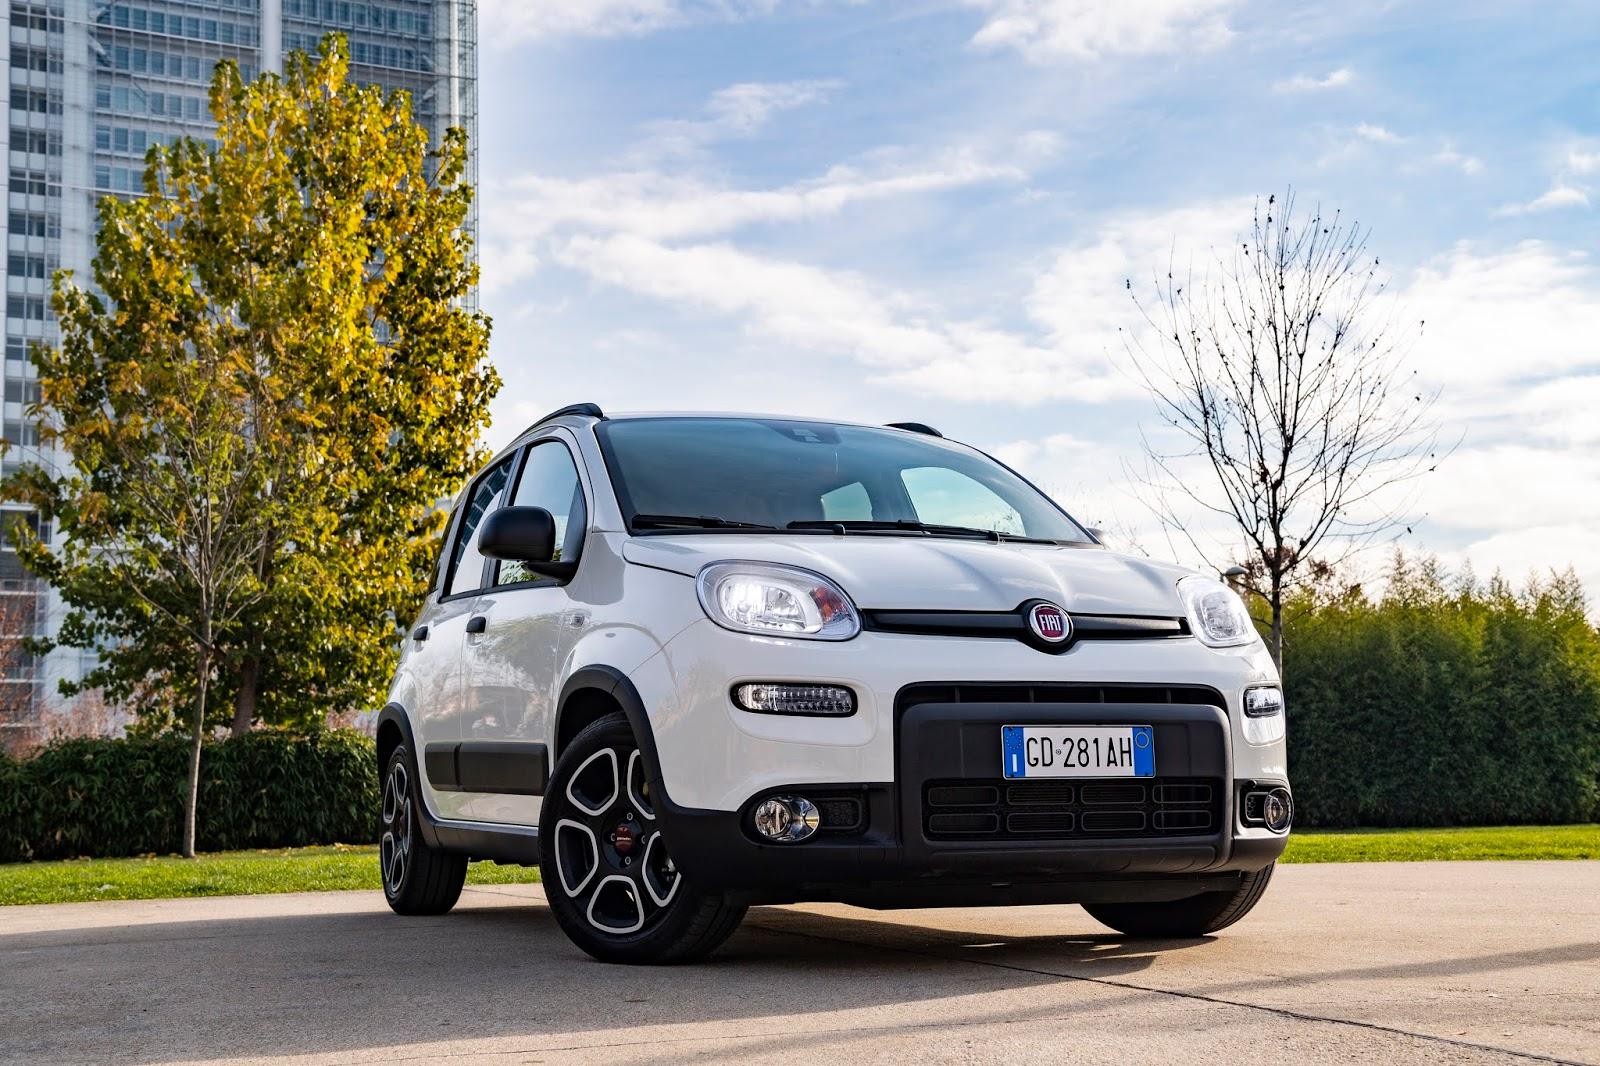 Panda2BCity2BLife2B252882529 Νέο Fiat Panda CNG : Οικονομία με στιλ και τεχνολογία CNG, Fiat, Fiat Panda, Panda, ειδήσεις